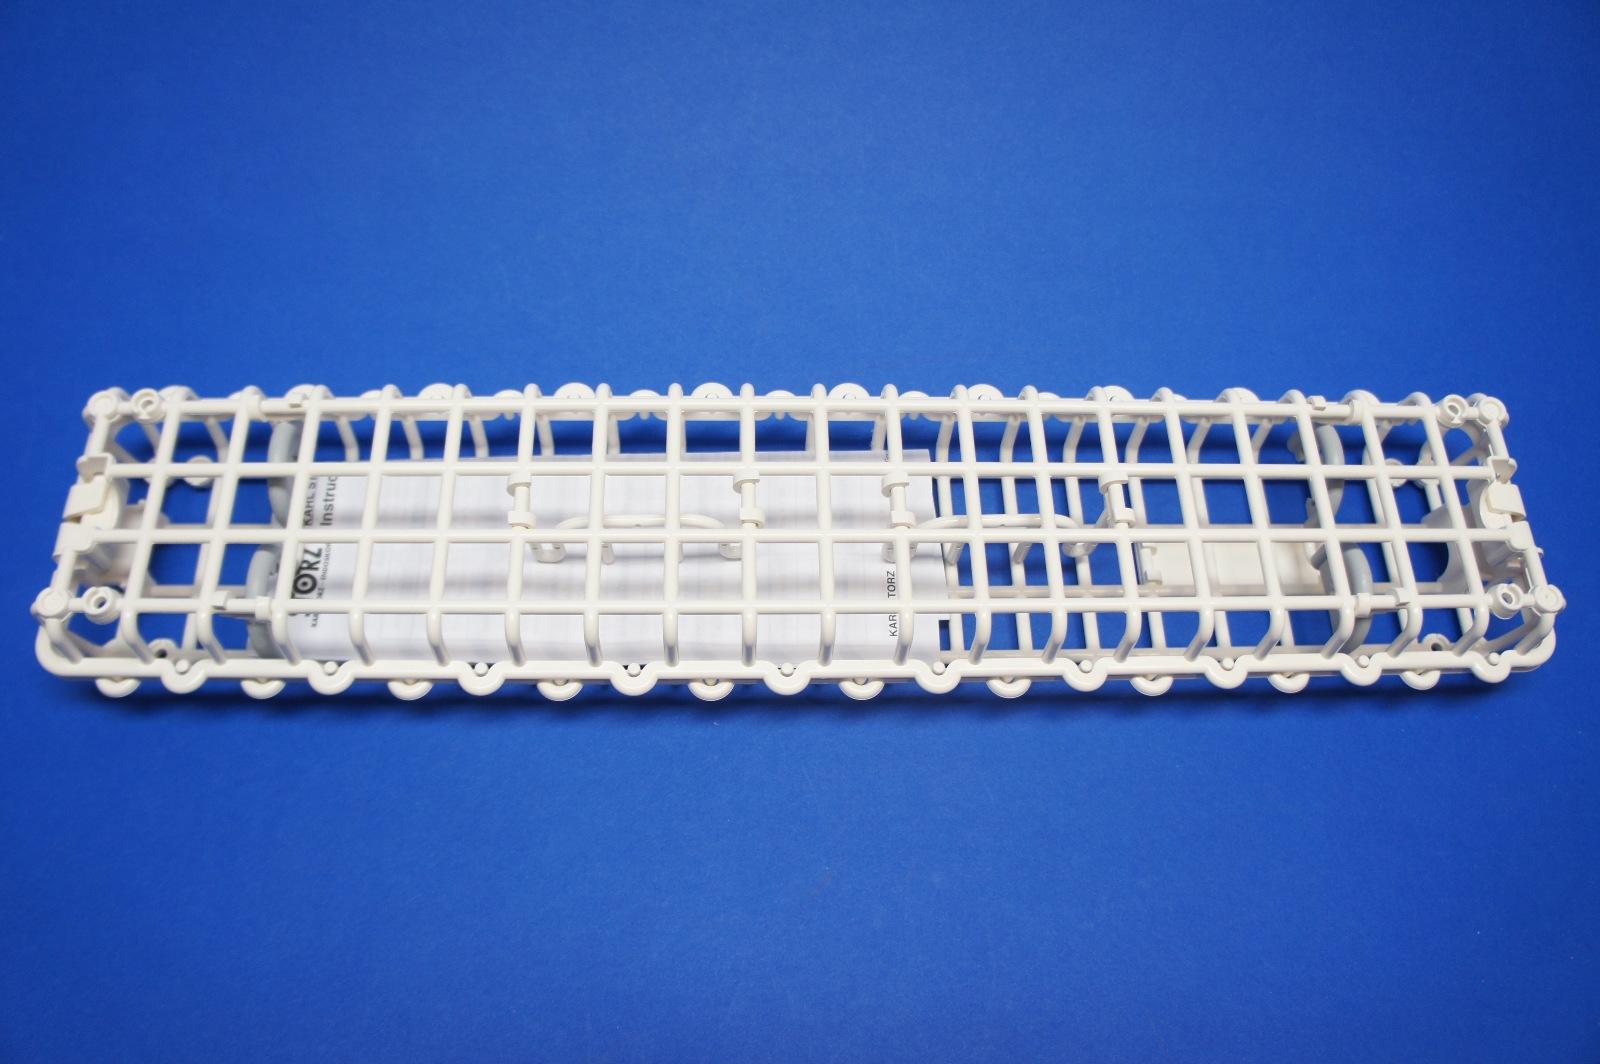 Karl storz 39305l2s sterrad compatible steriliz basket tray diameter - Diametre panier basket ...